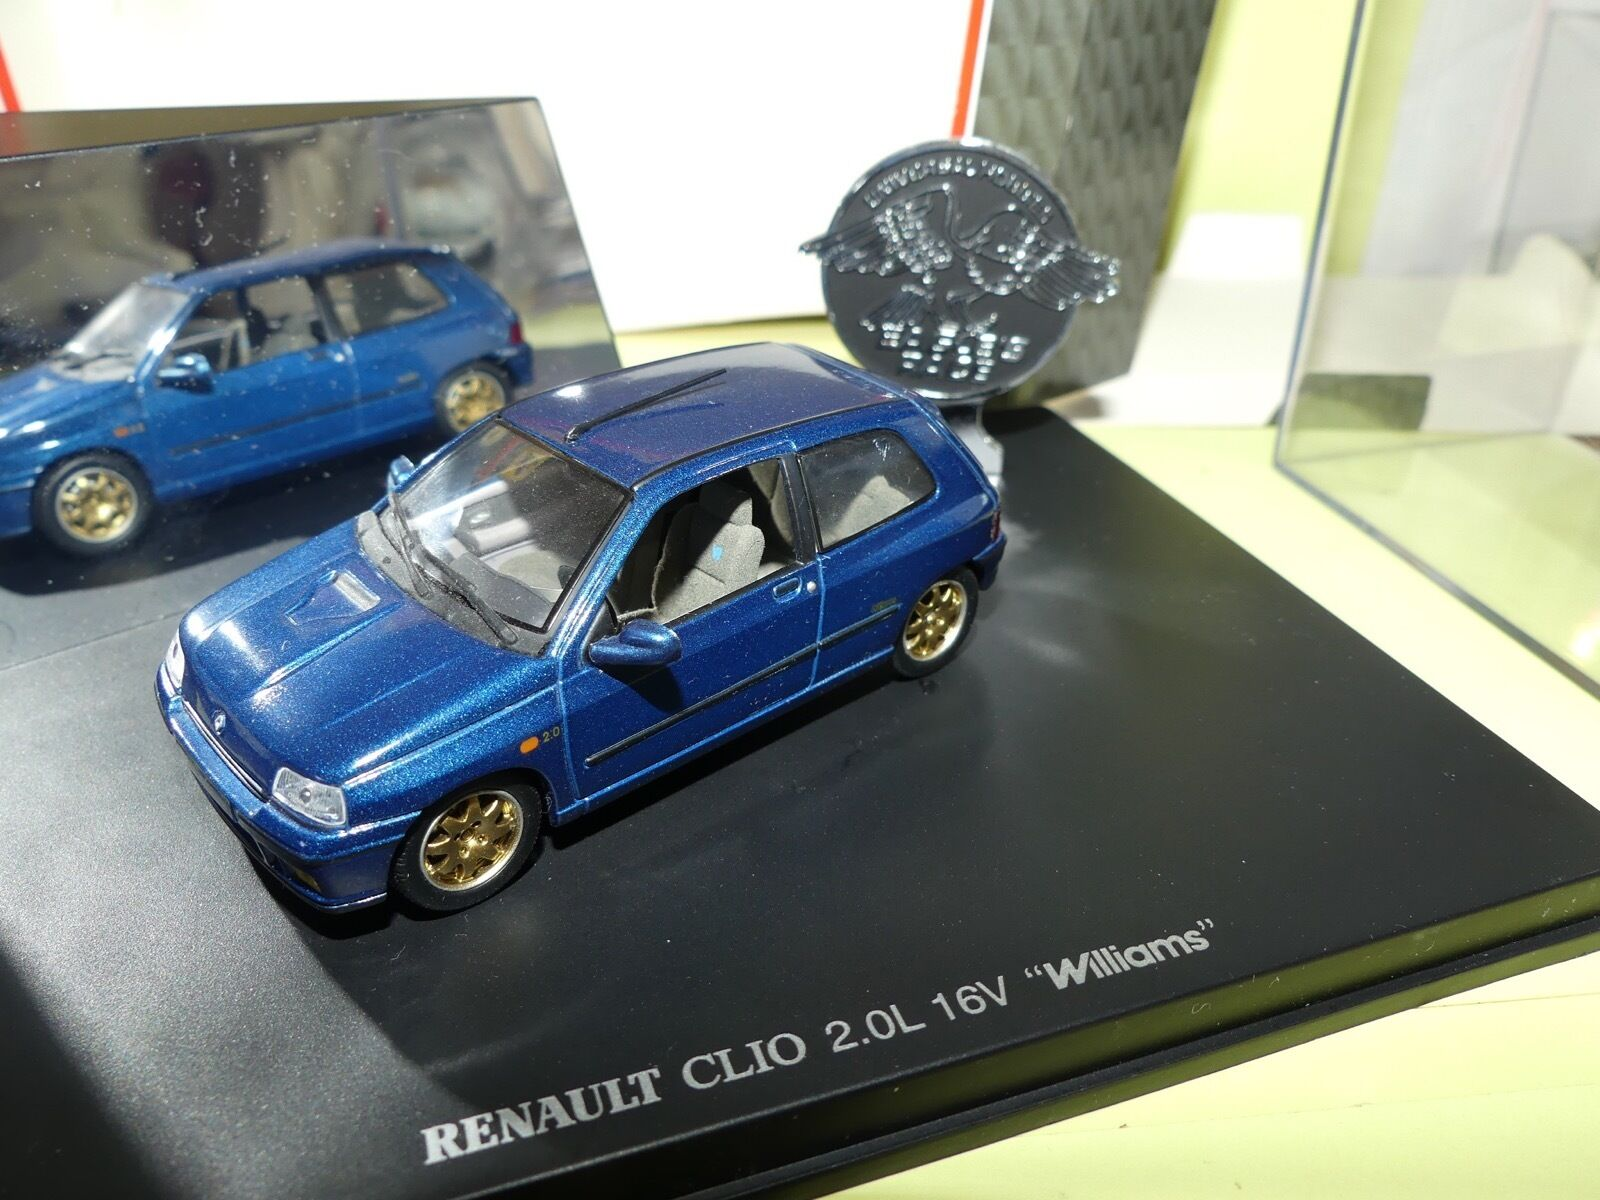 RENAULT CLIO 2.0L 16V WILLIAMS UNIVERSAL HOBBIES 1 43